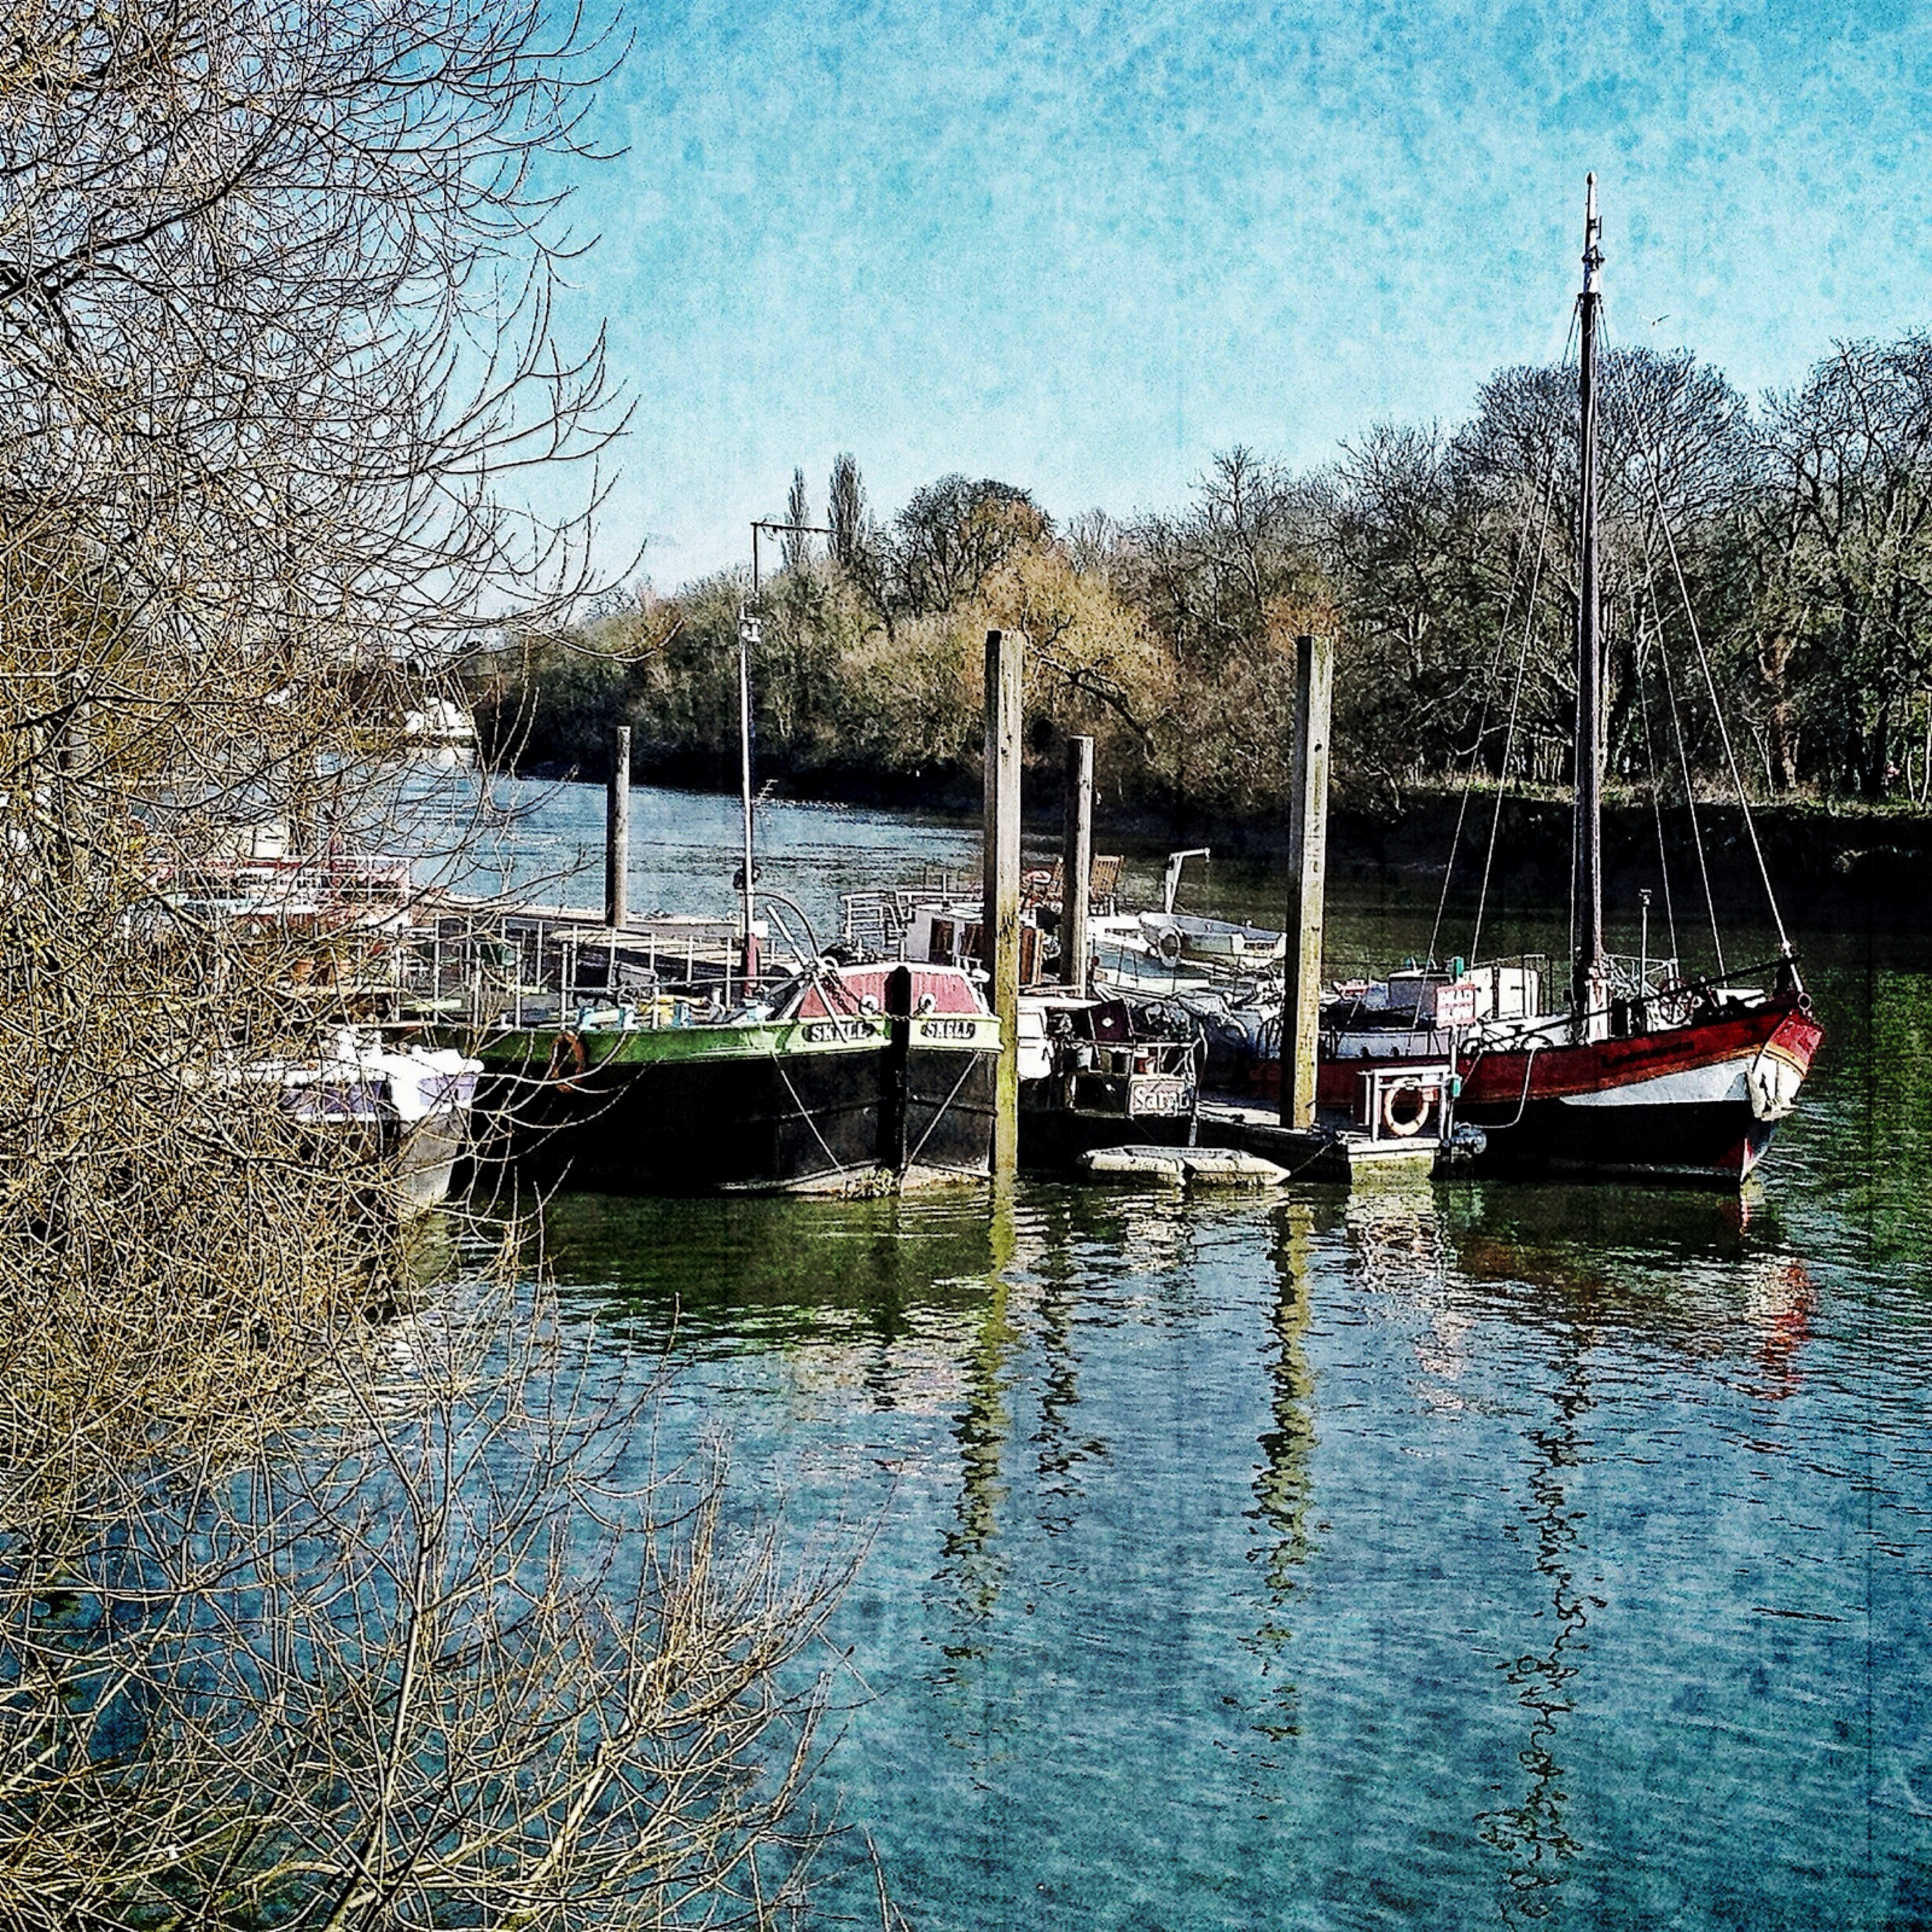 Veevs Hanson ~ Sun shines on the house boats